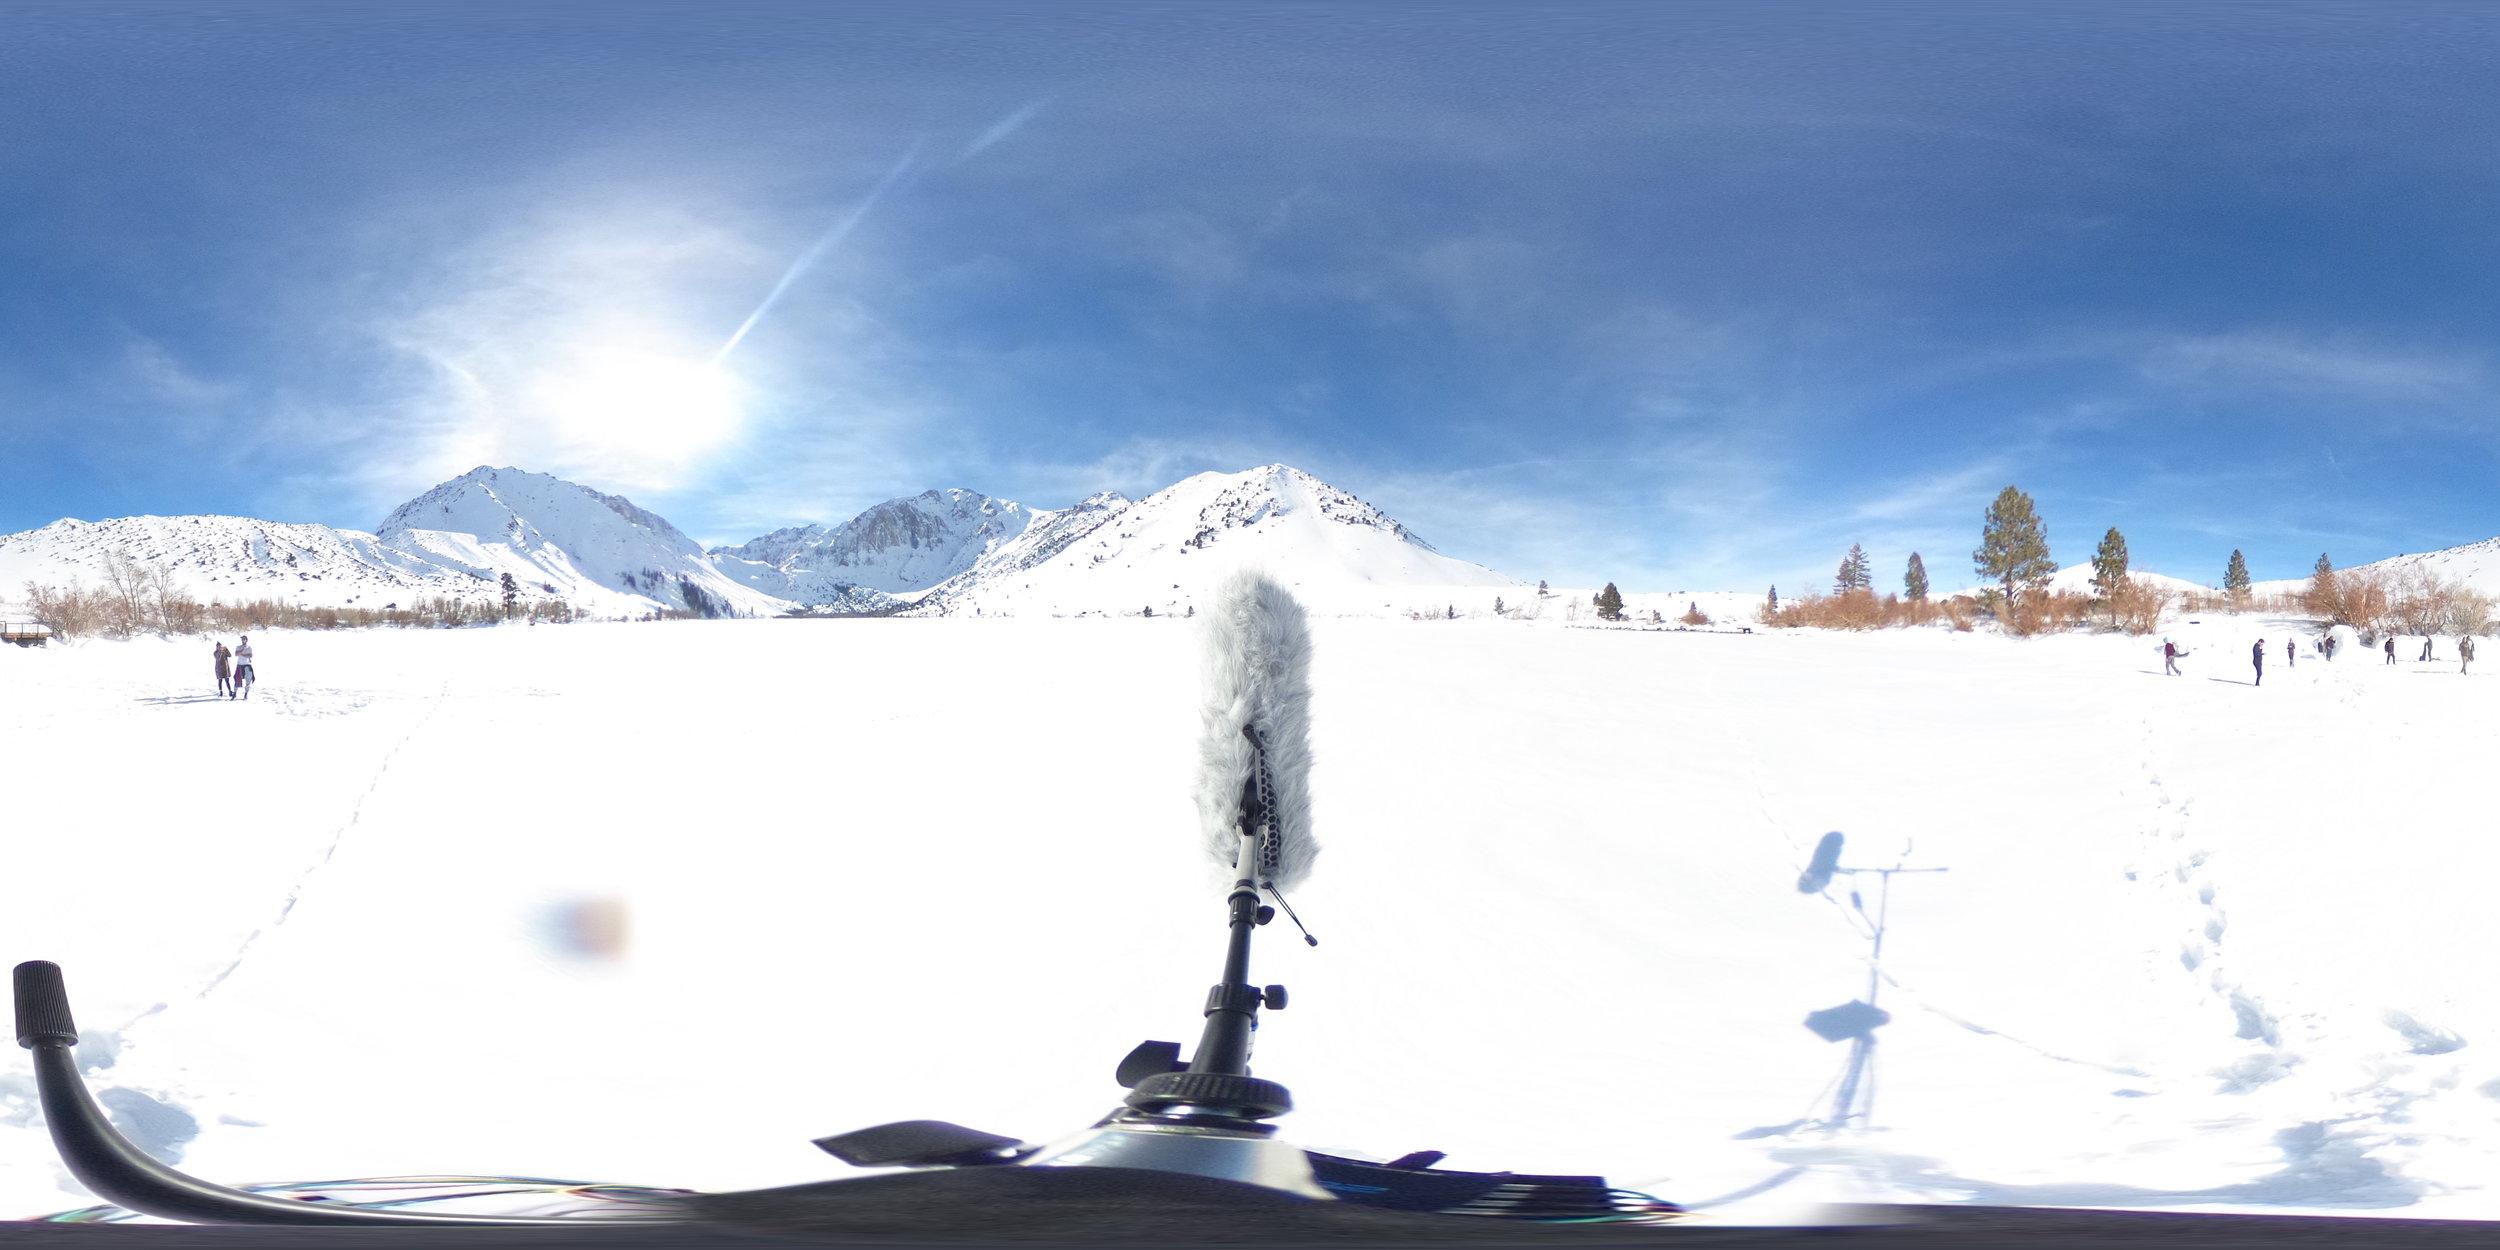 EXT_Day_Snow_FrozenLake_DistantGroupPlaying_SteadyLightWind_AmbiX.JPG